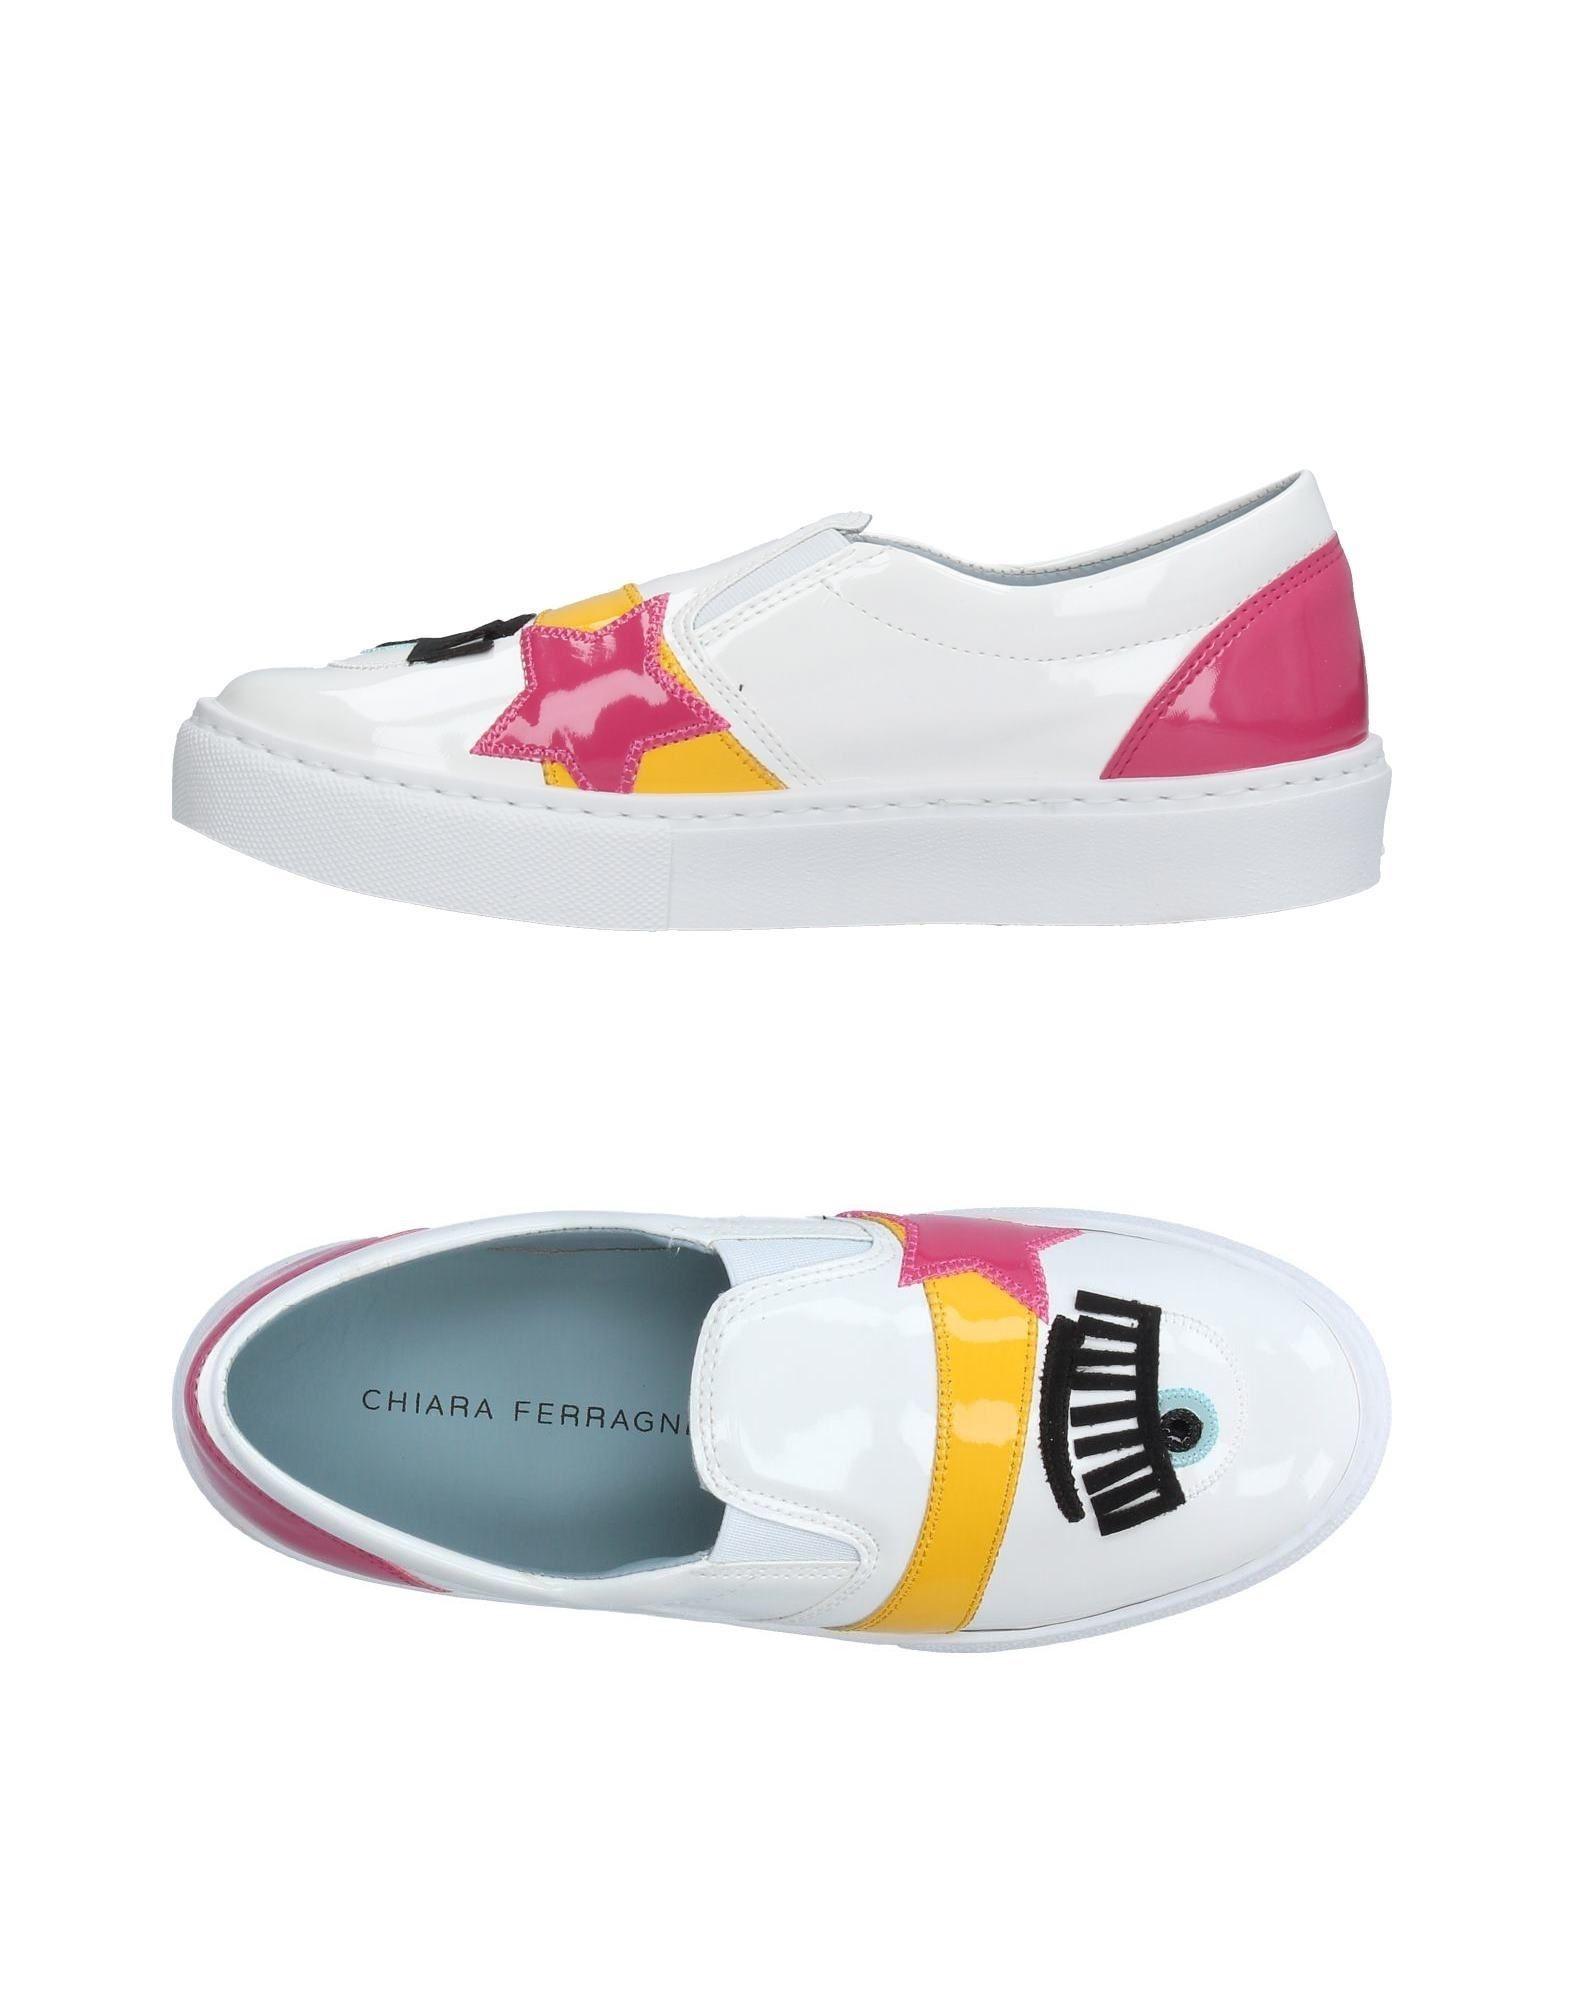 Stilvolle billige Schuhe Chiara Ferragni 11227951HA Sneakers Damen  11227951HA Ferragni 8f49f4